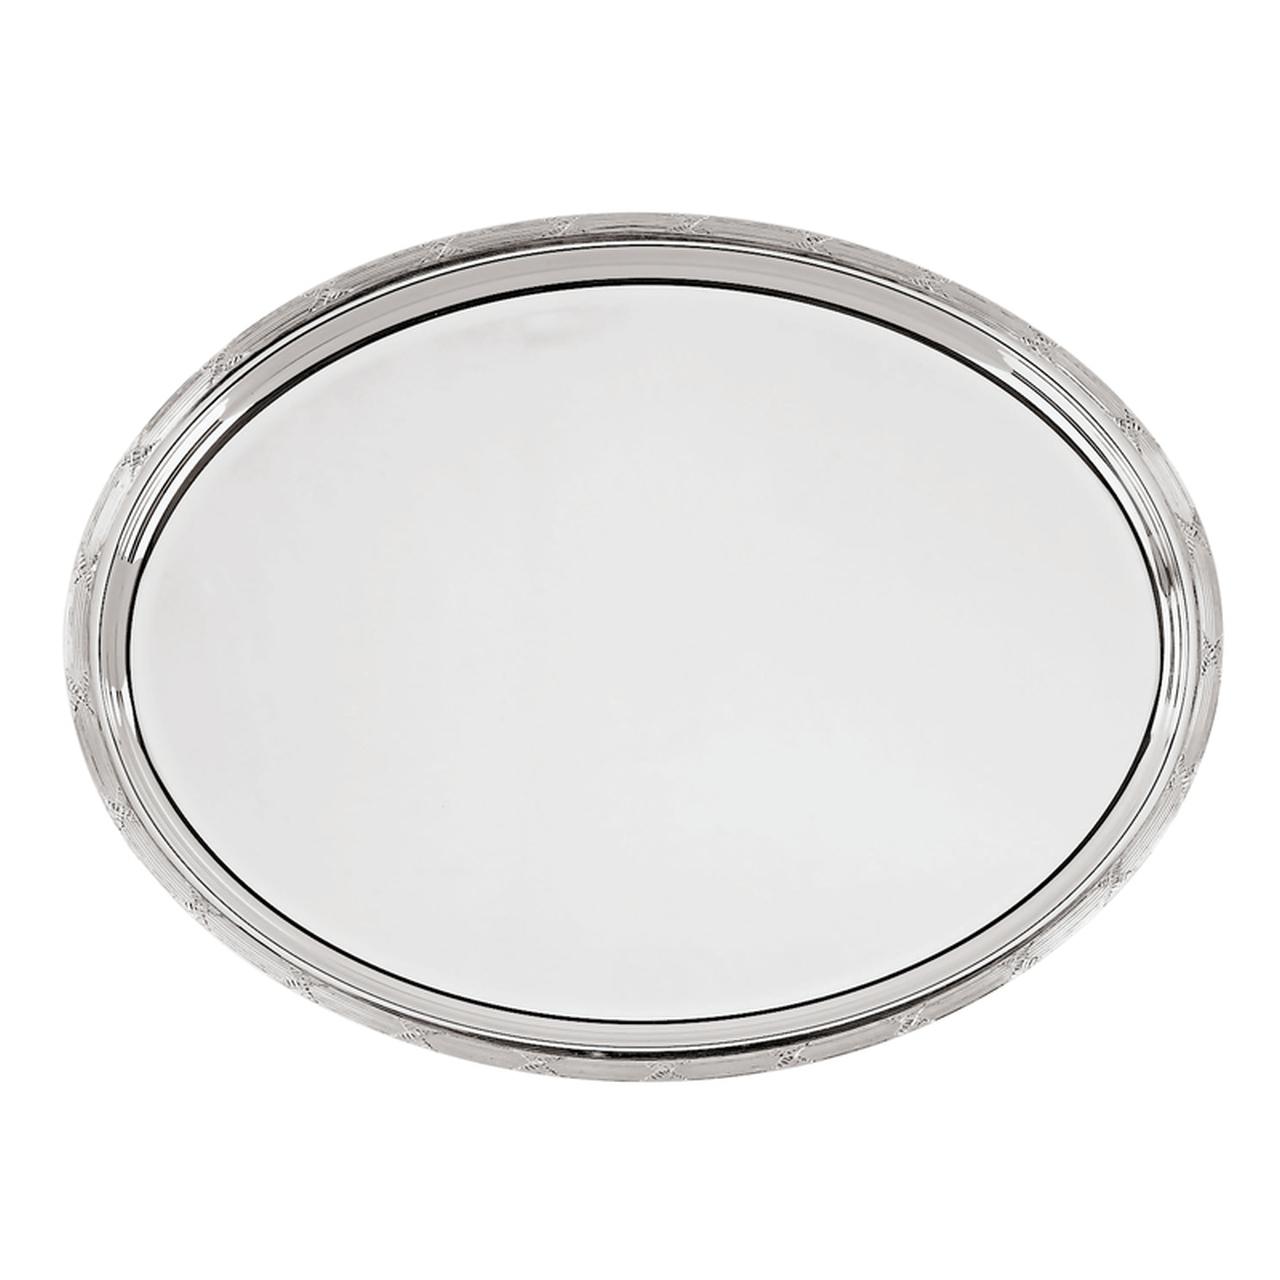 Vassoio ovale argentato argento sheffield stile Rubans